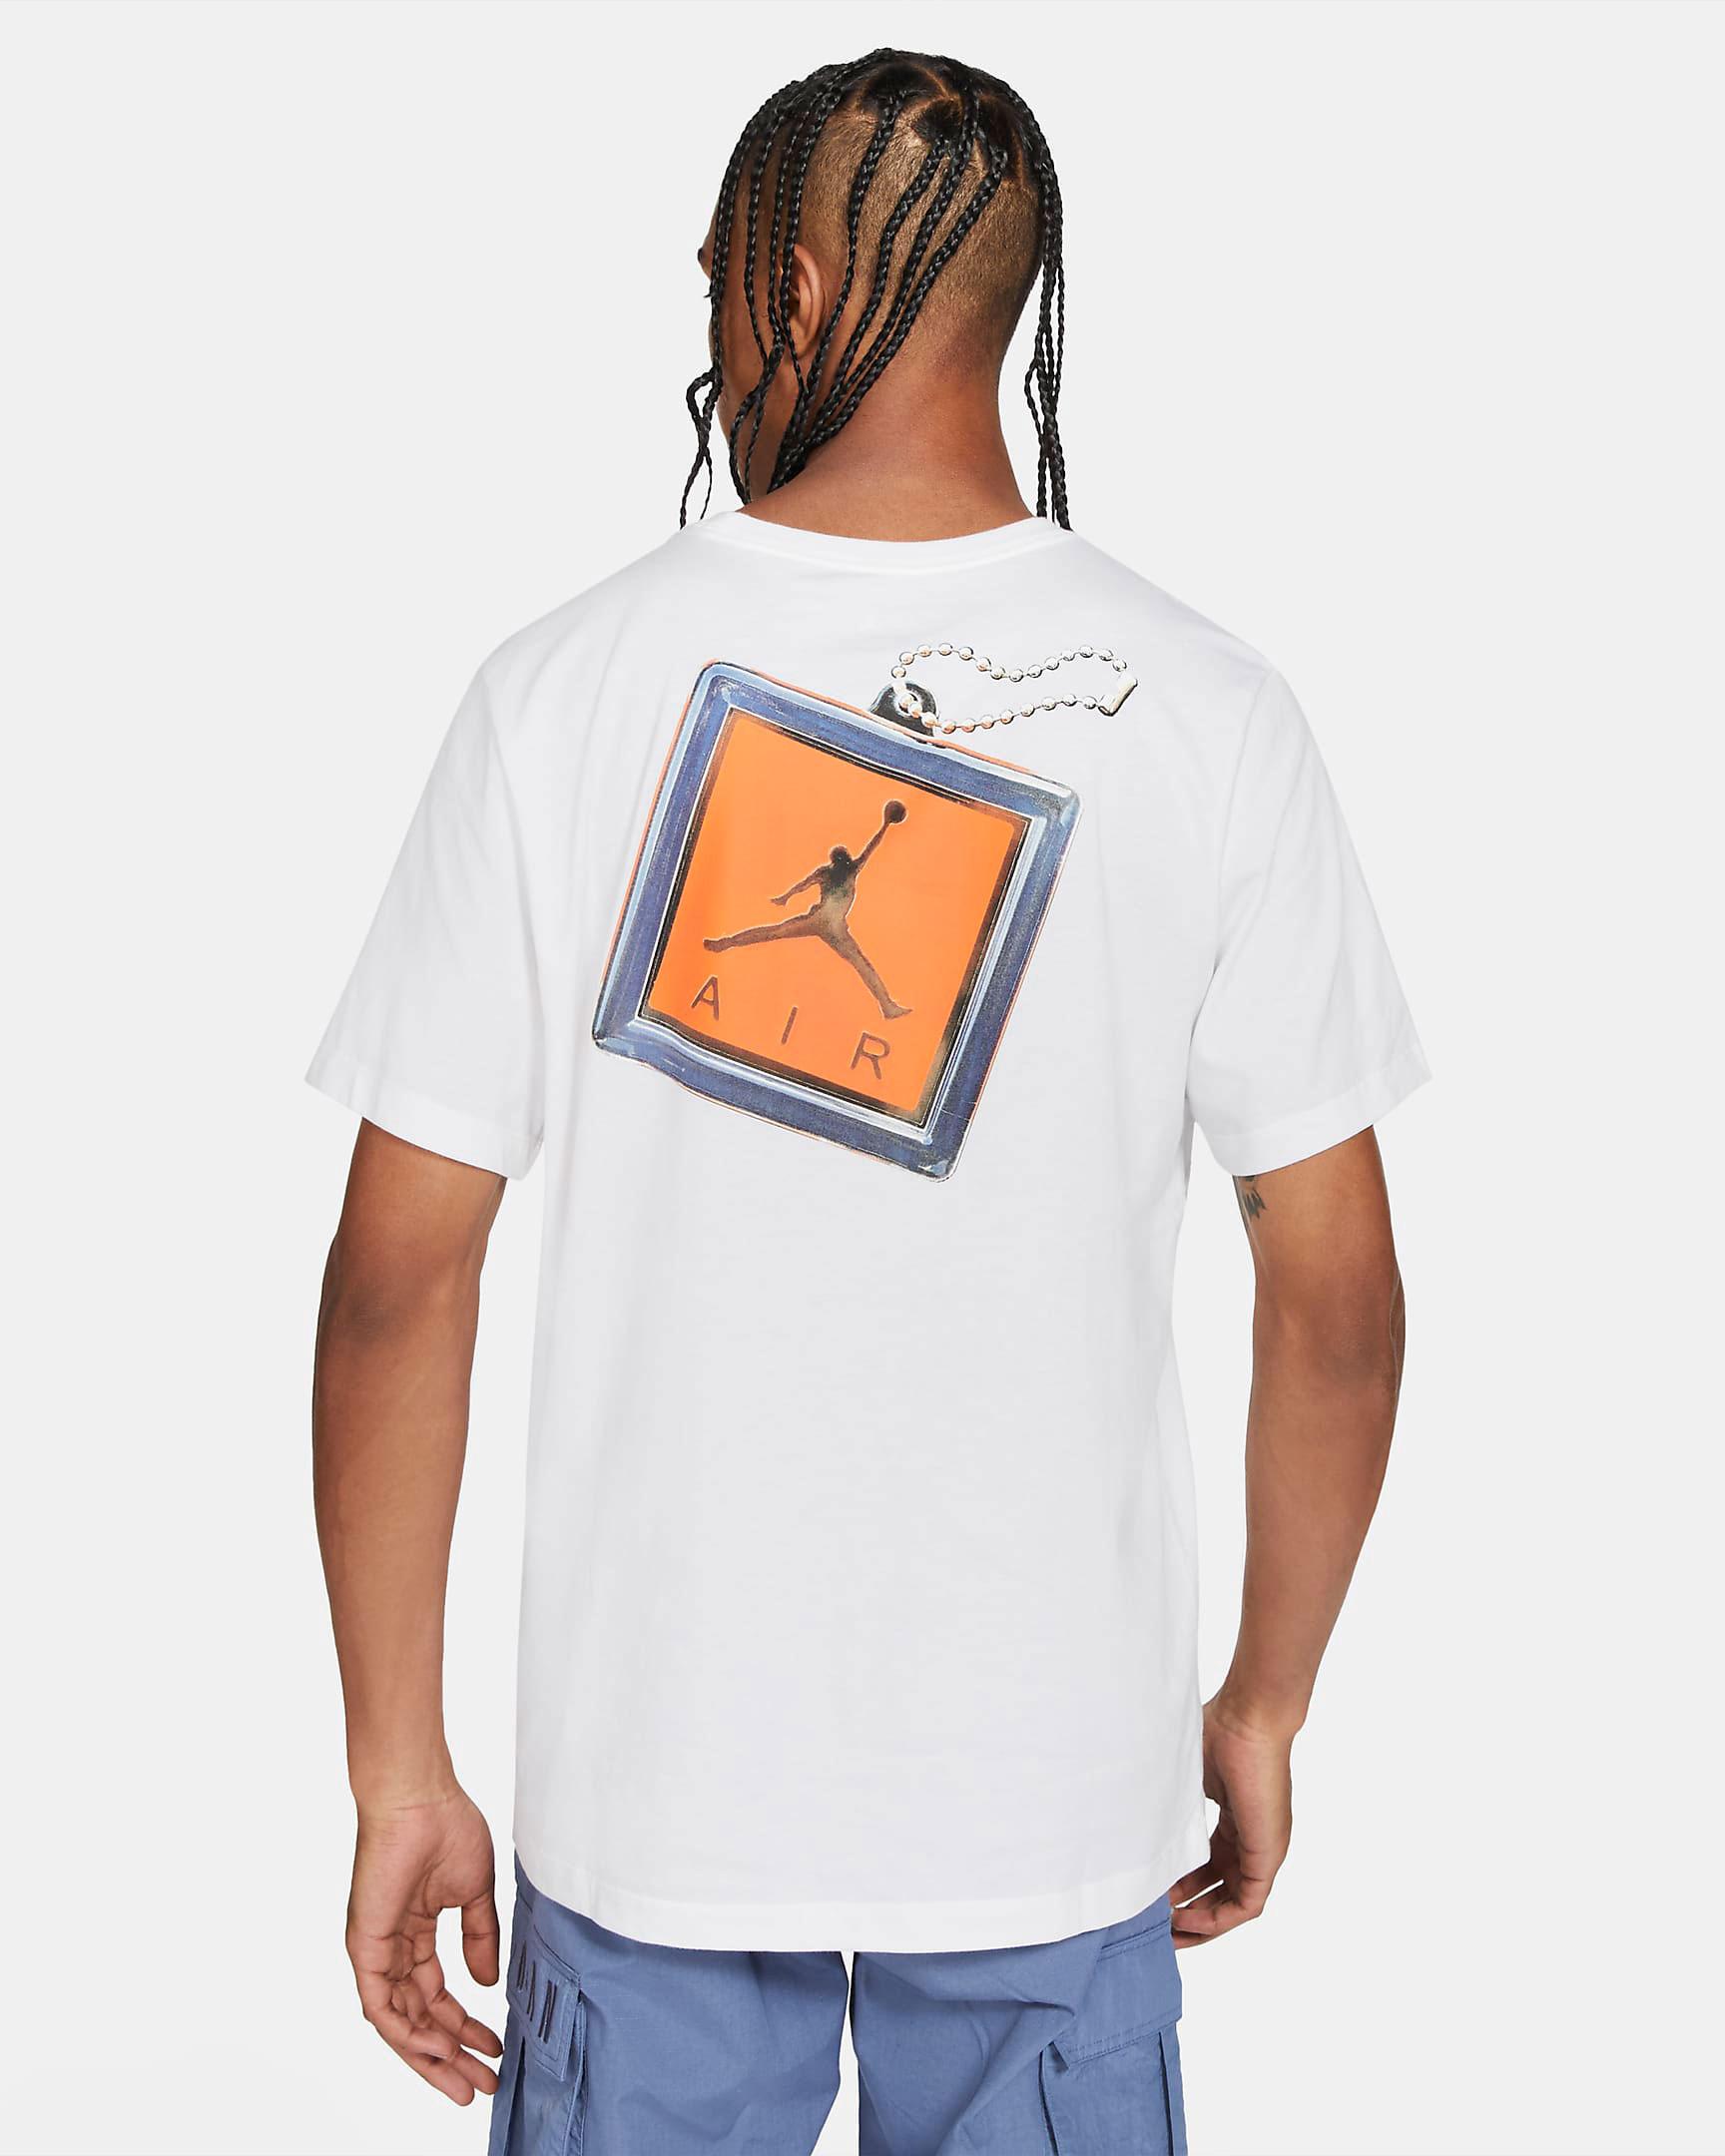 air-jordan-11-low-bright-citrus-shirt-match-2